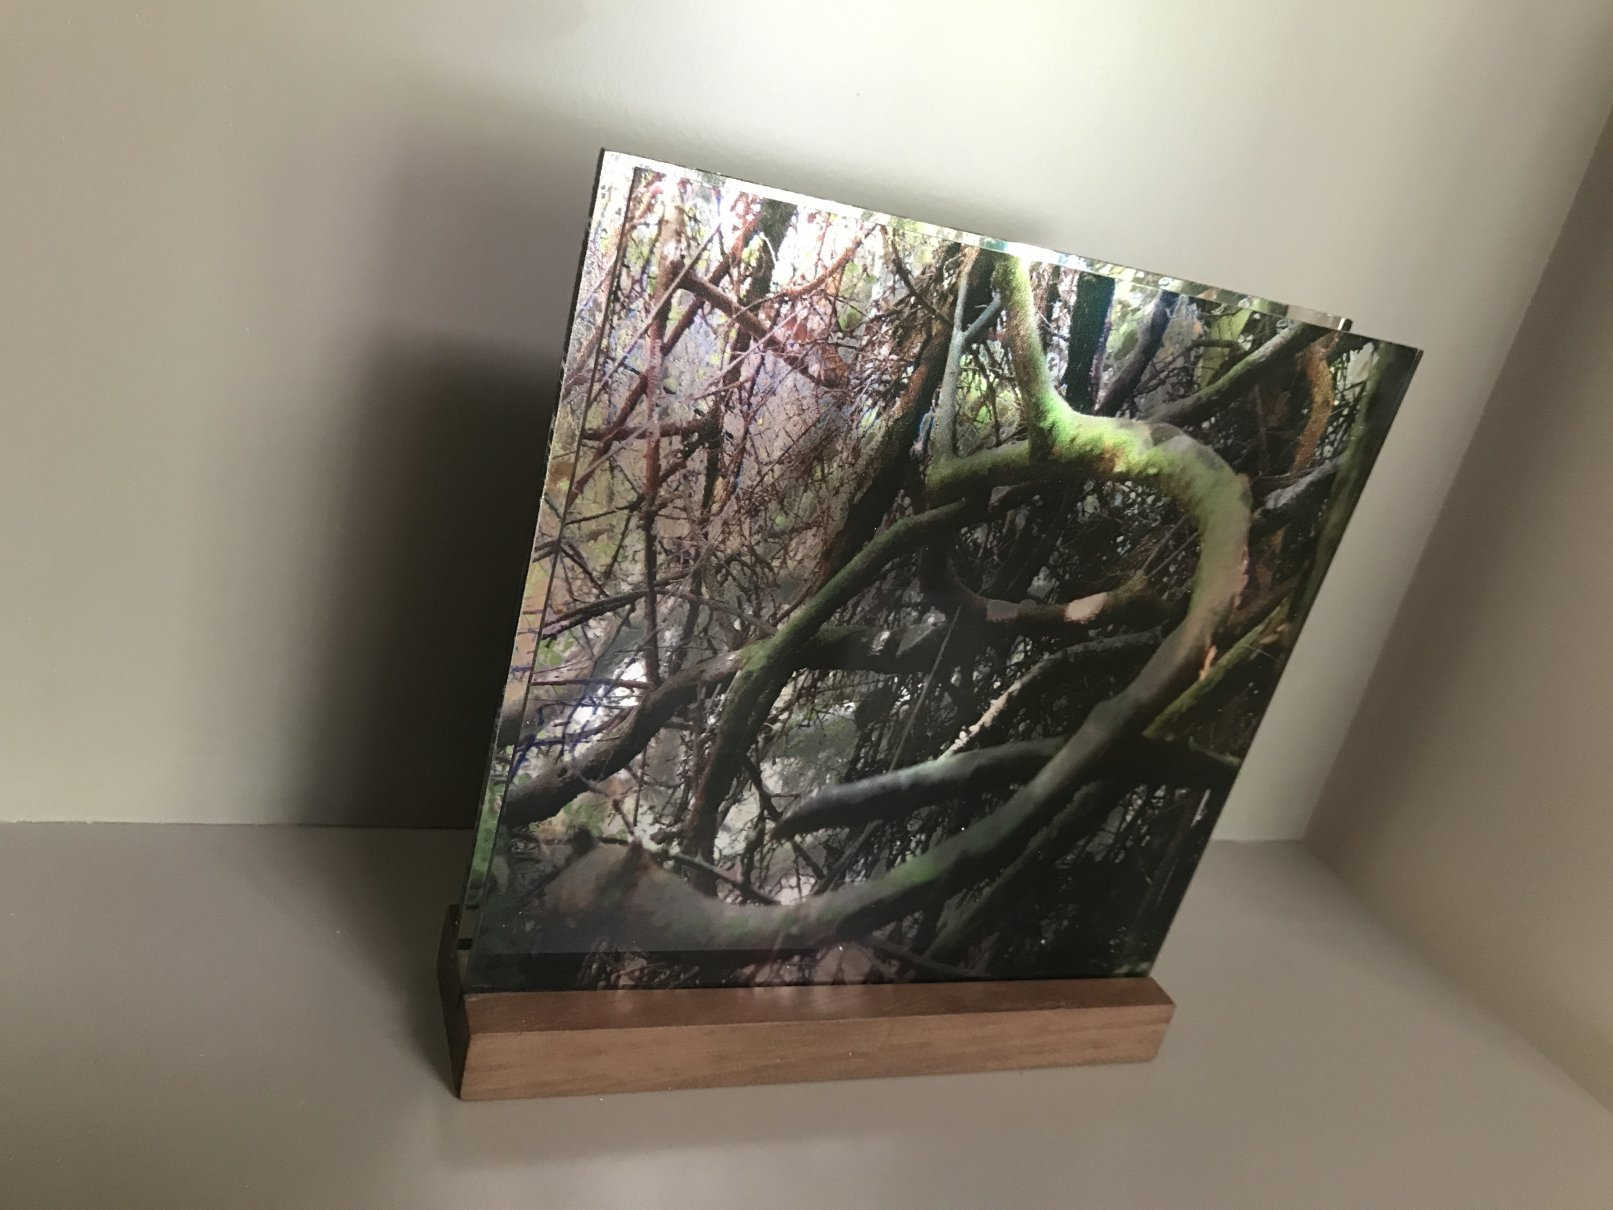 De la serie Bosques (2017) - Mirta Gendin